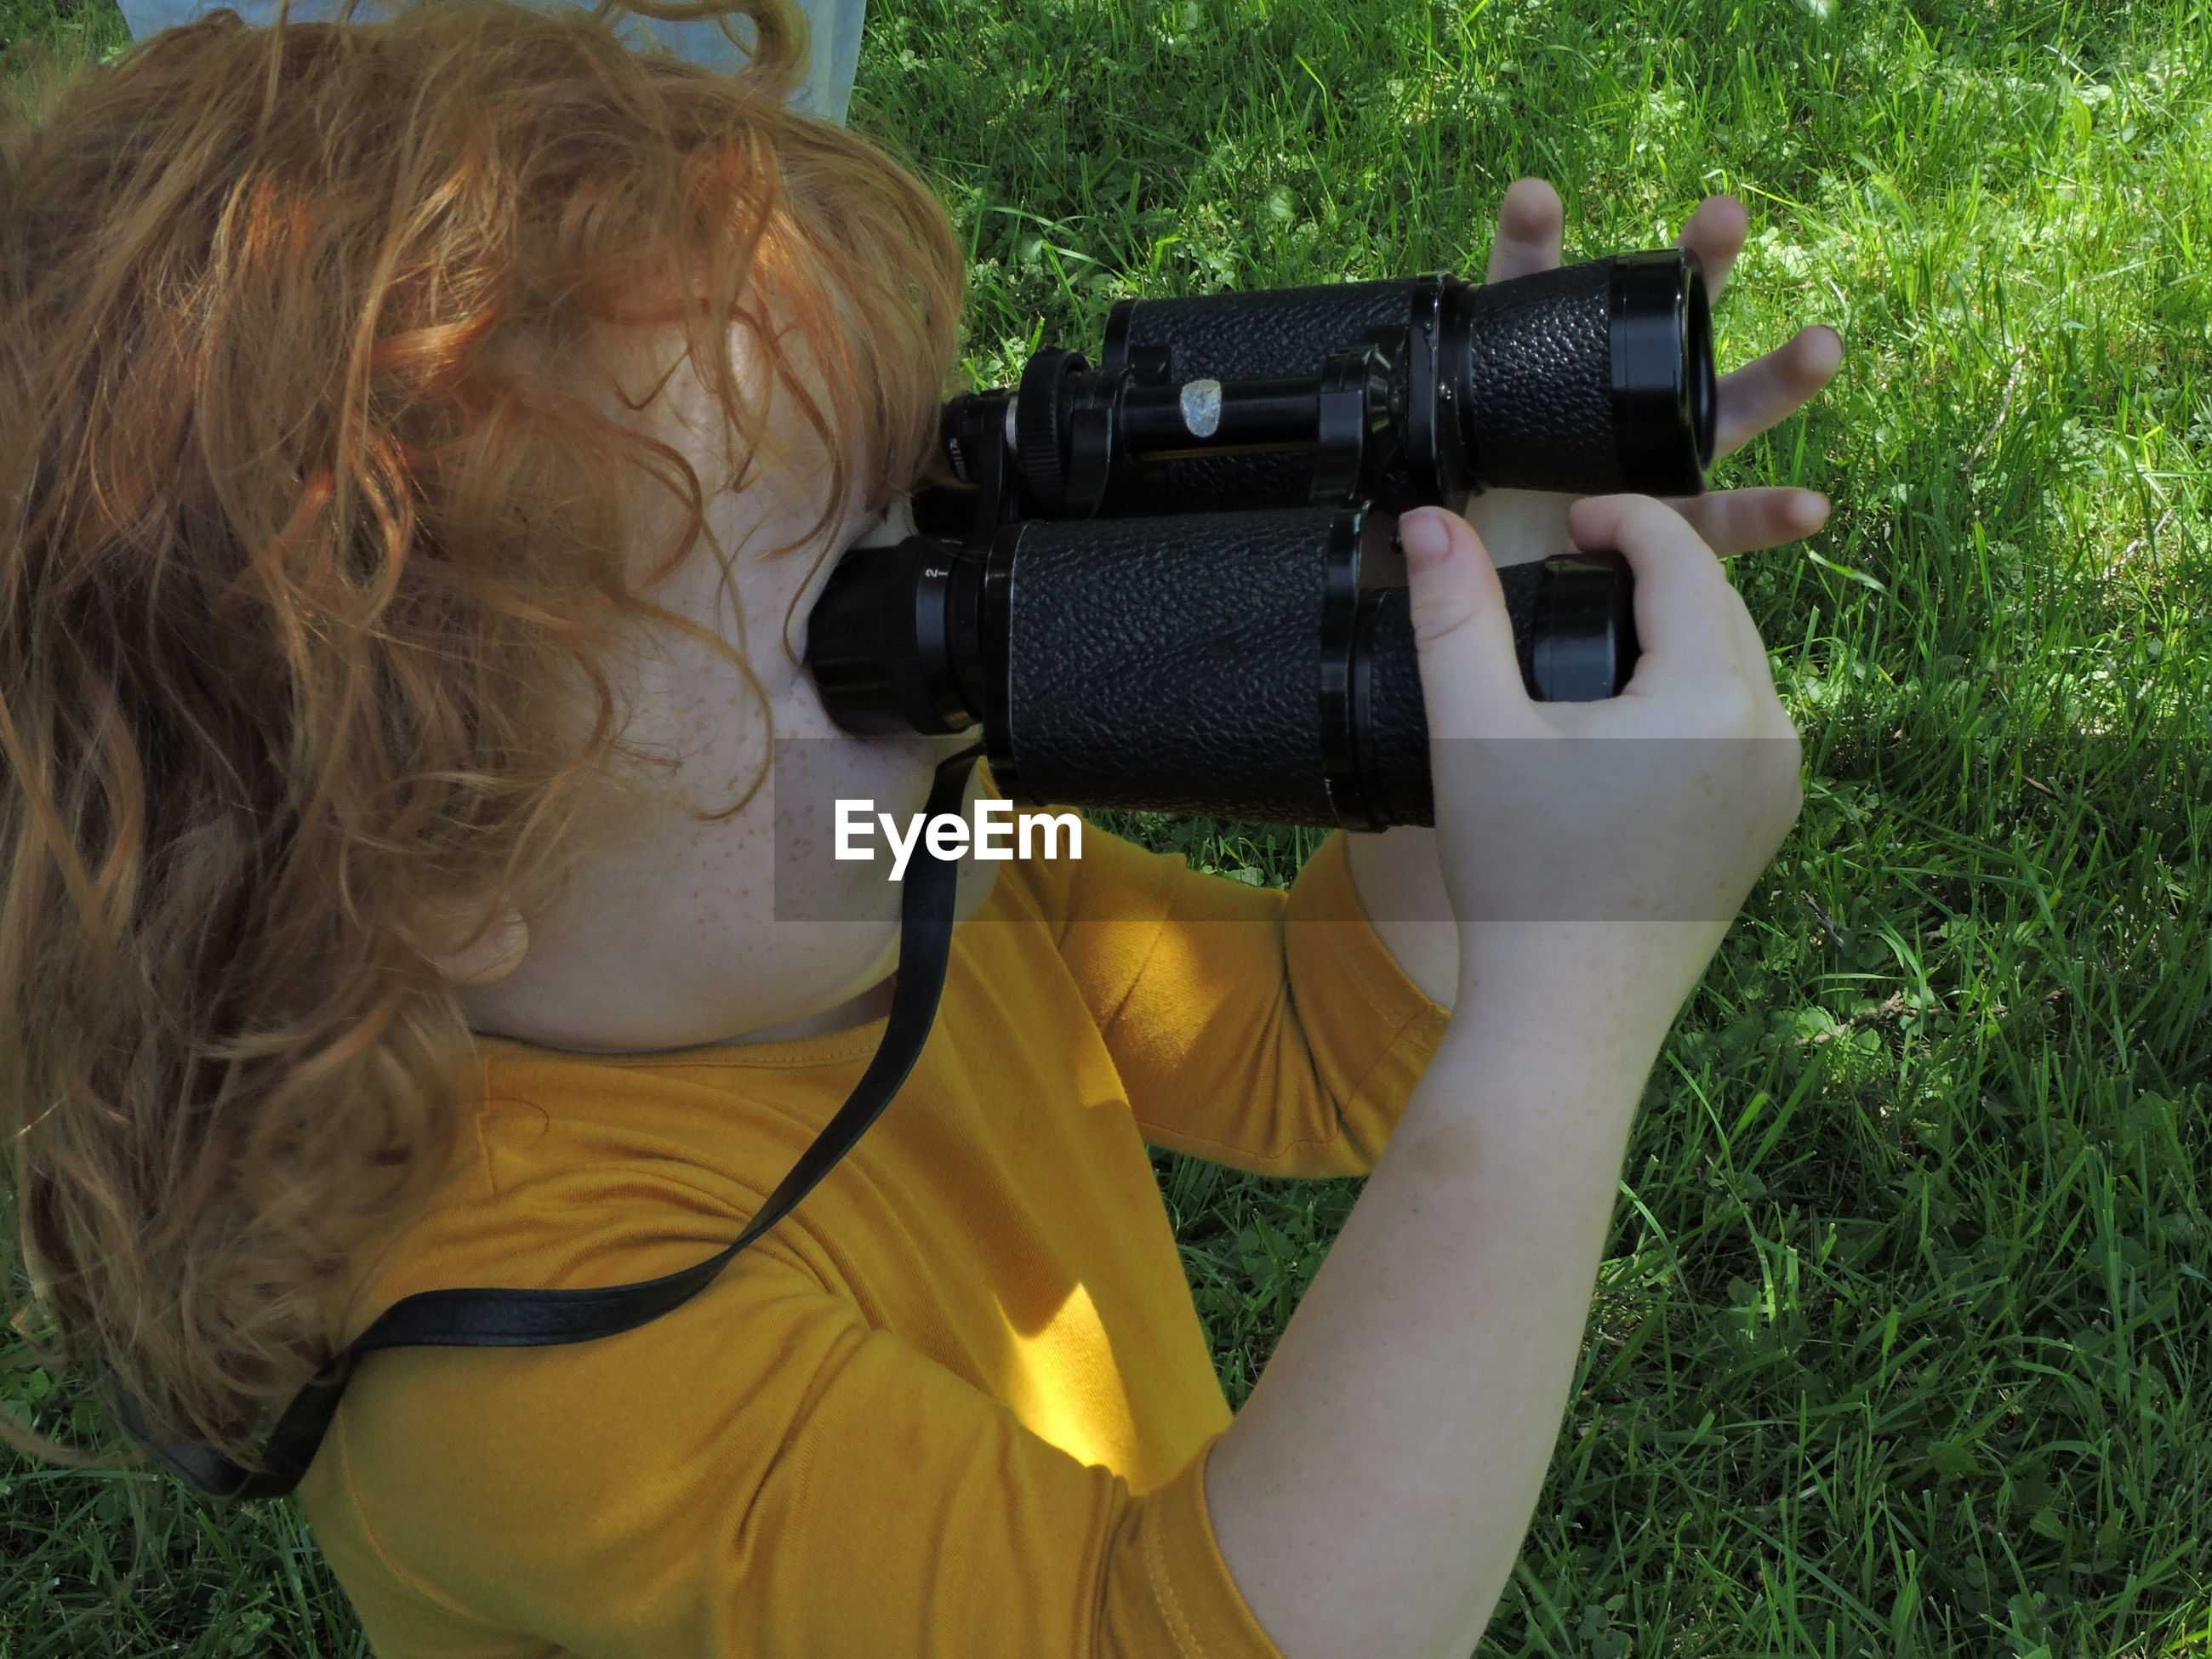 Girl holding binoculars in park